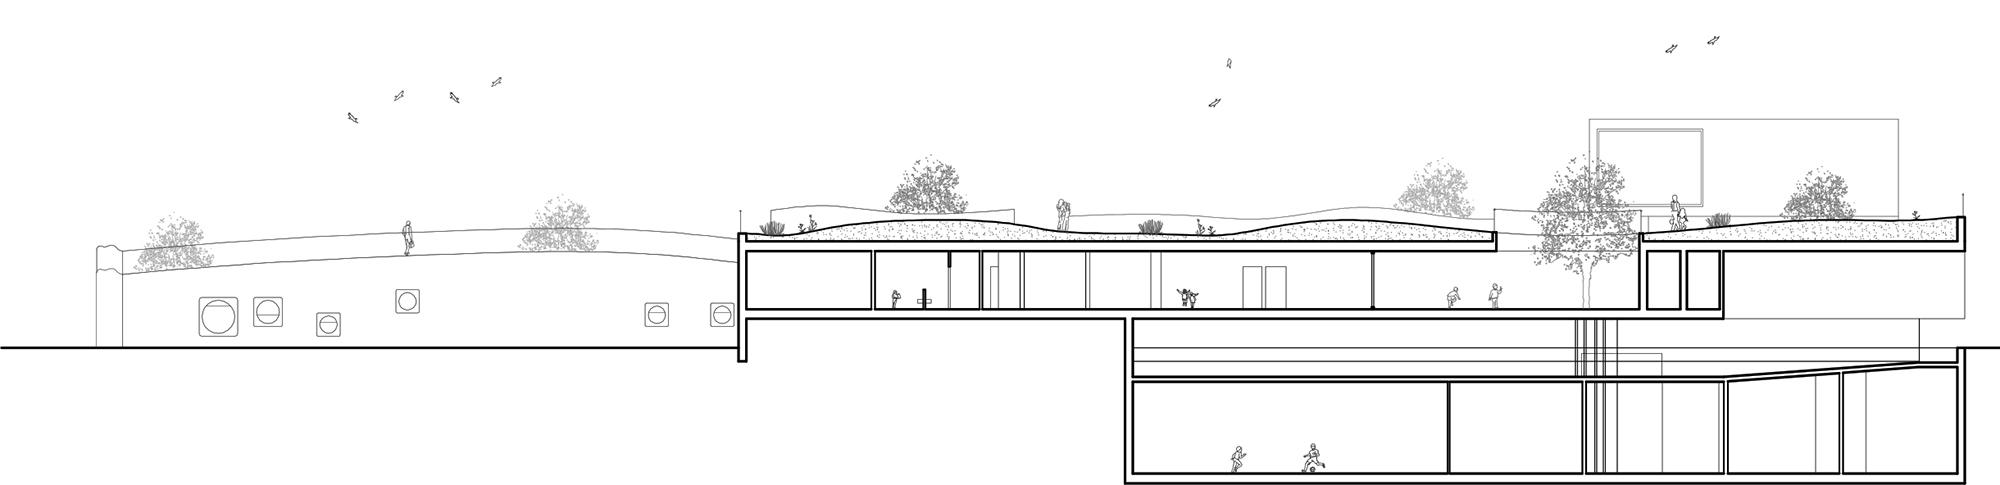 Architektur_offizin-a_gatto.weber.architekten_Projekte_Kultur_HiBaloo_07.jpg